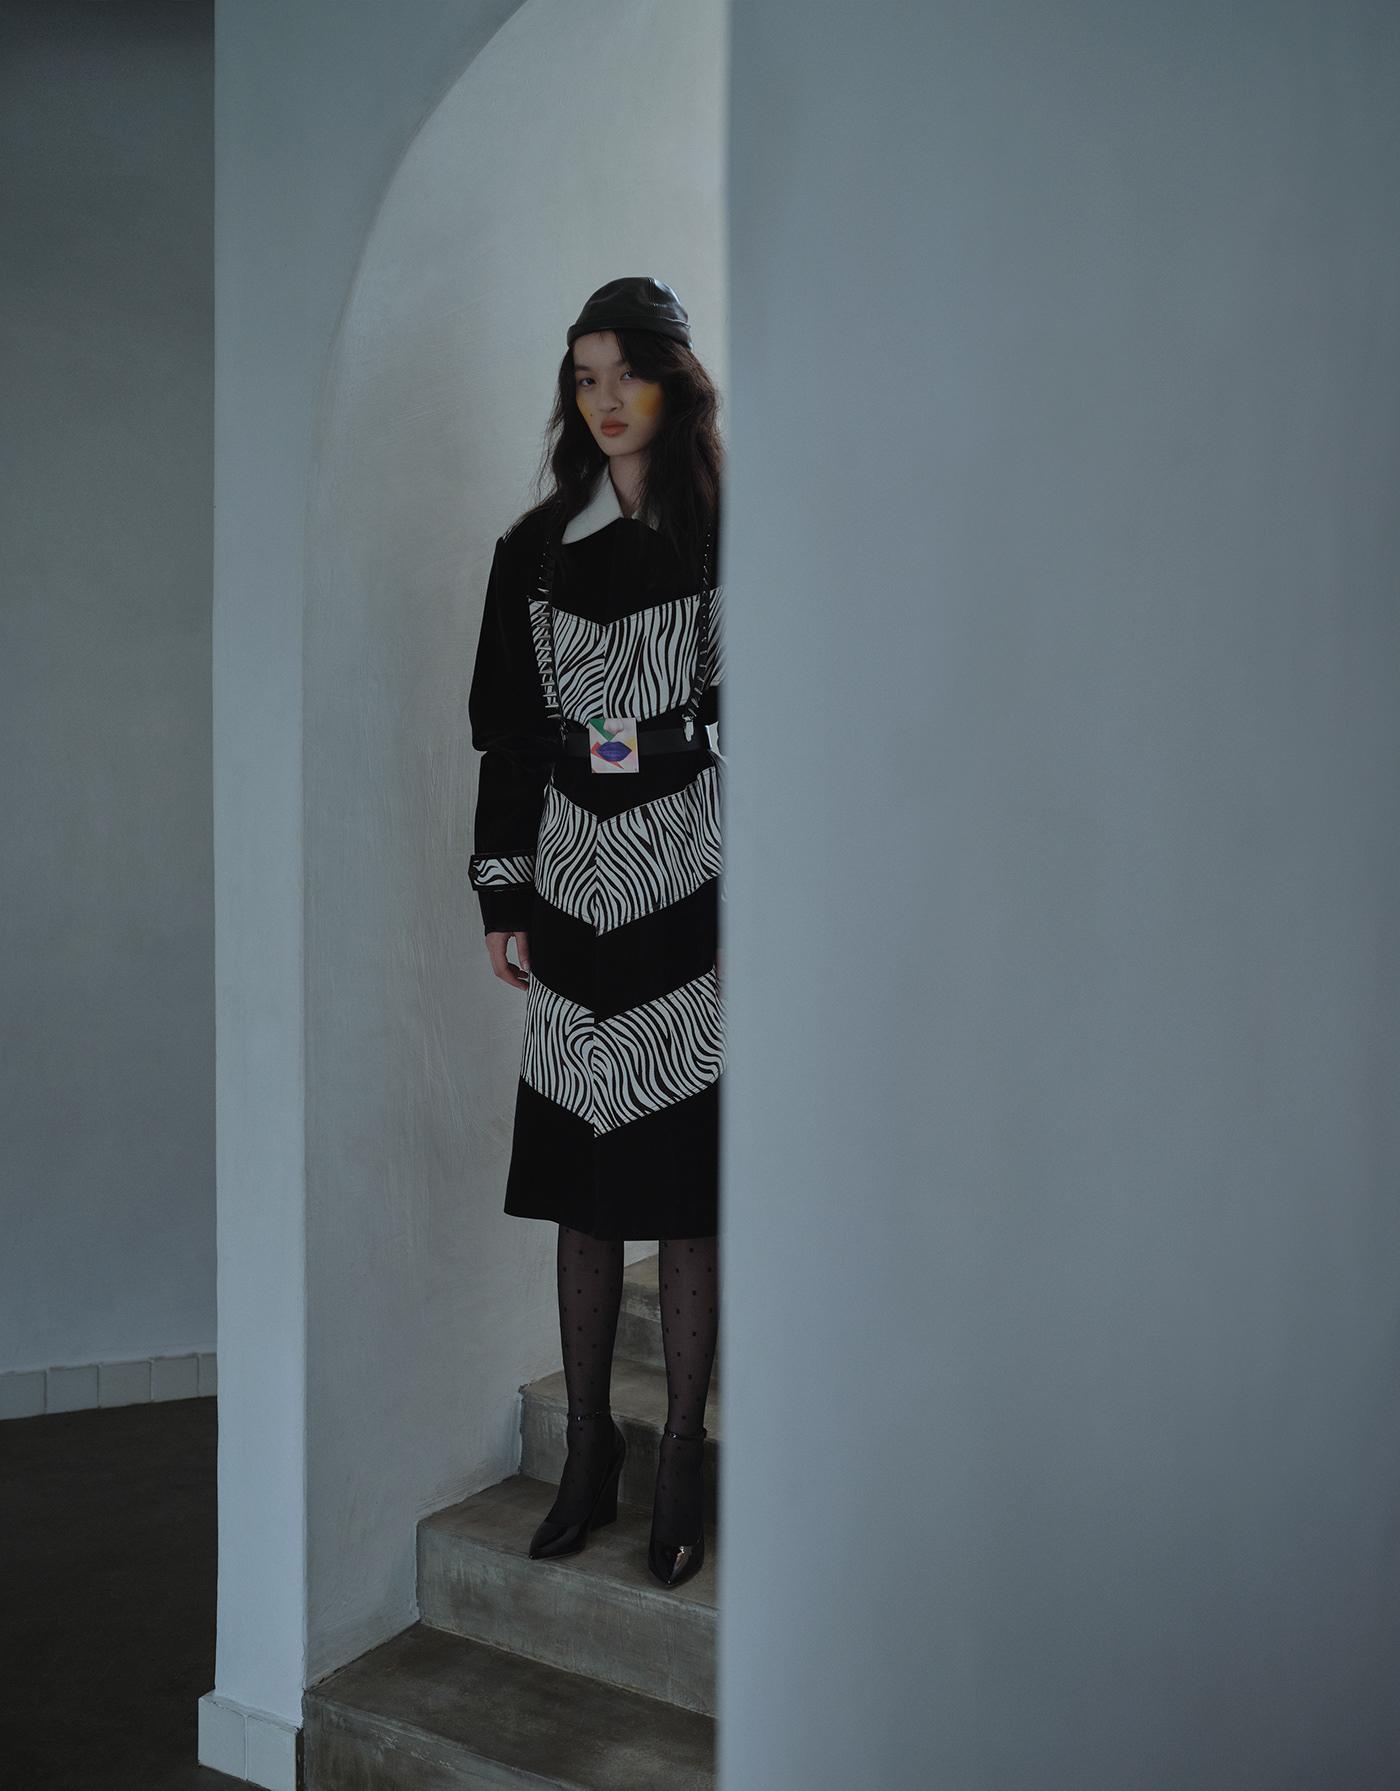 Image may contain: clothing, wall and dress